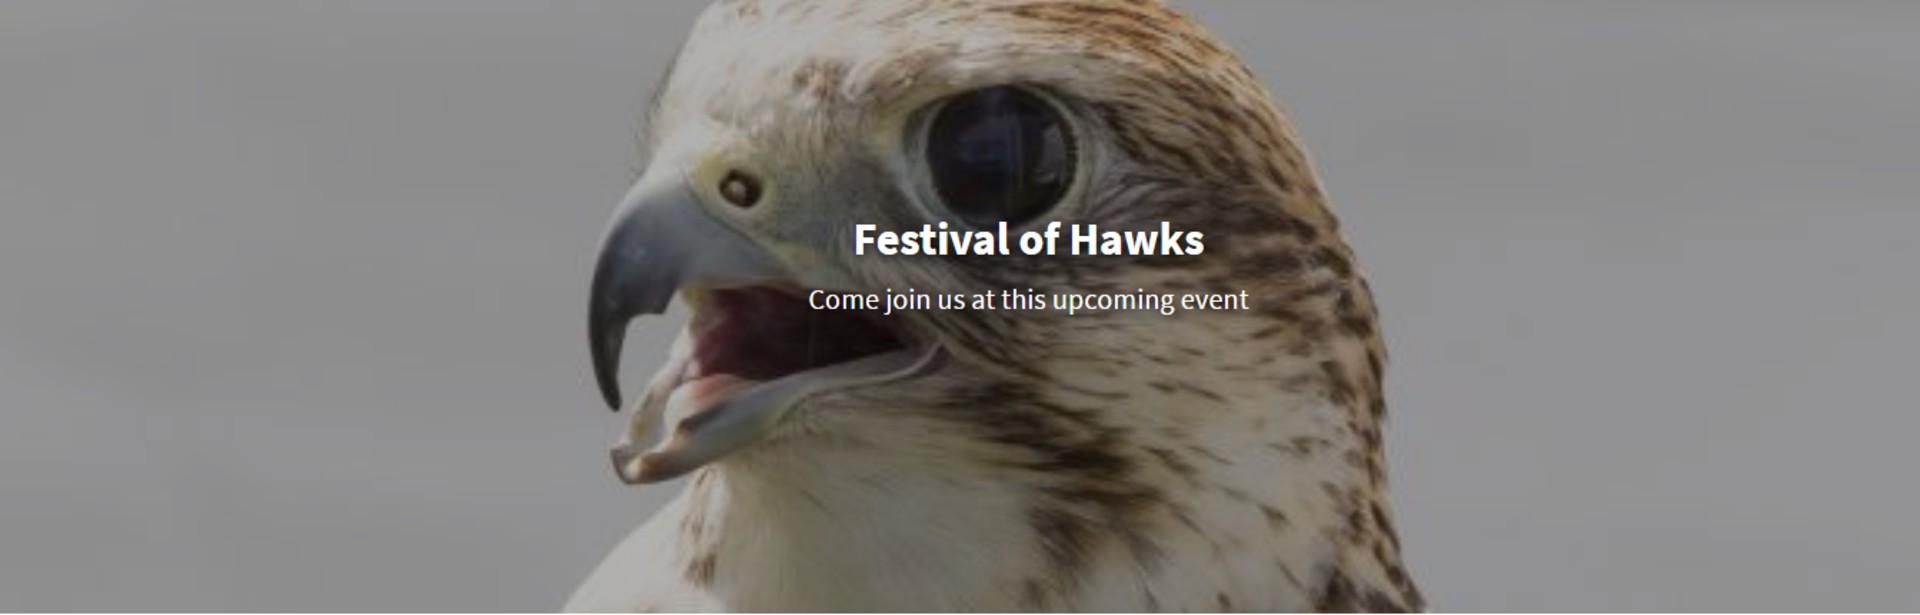 Festival of Hawks